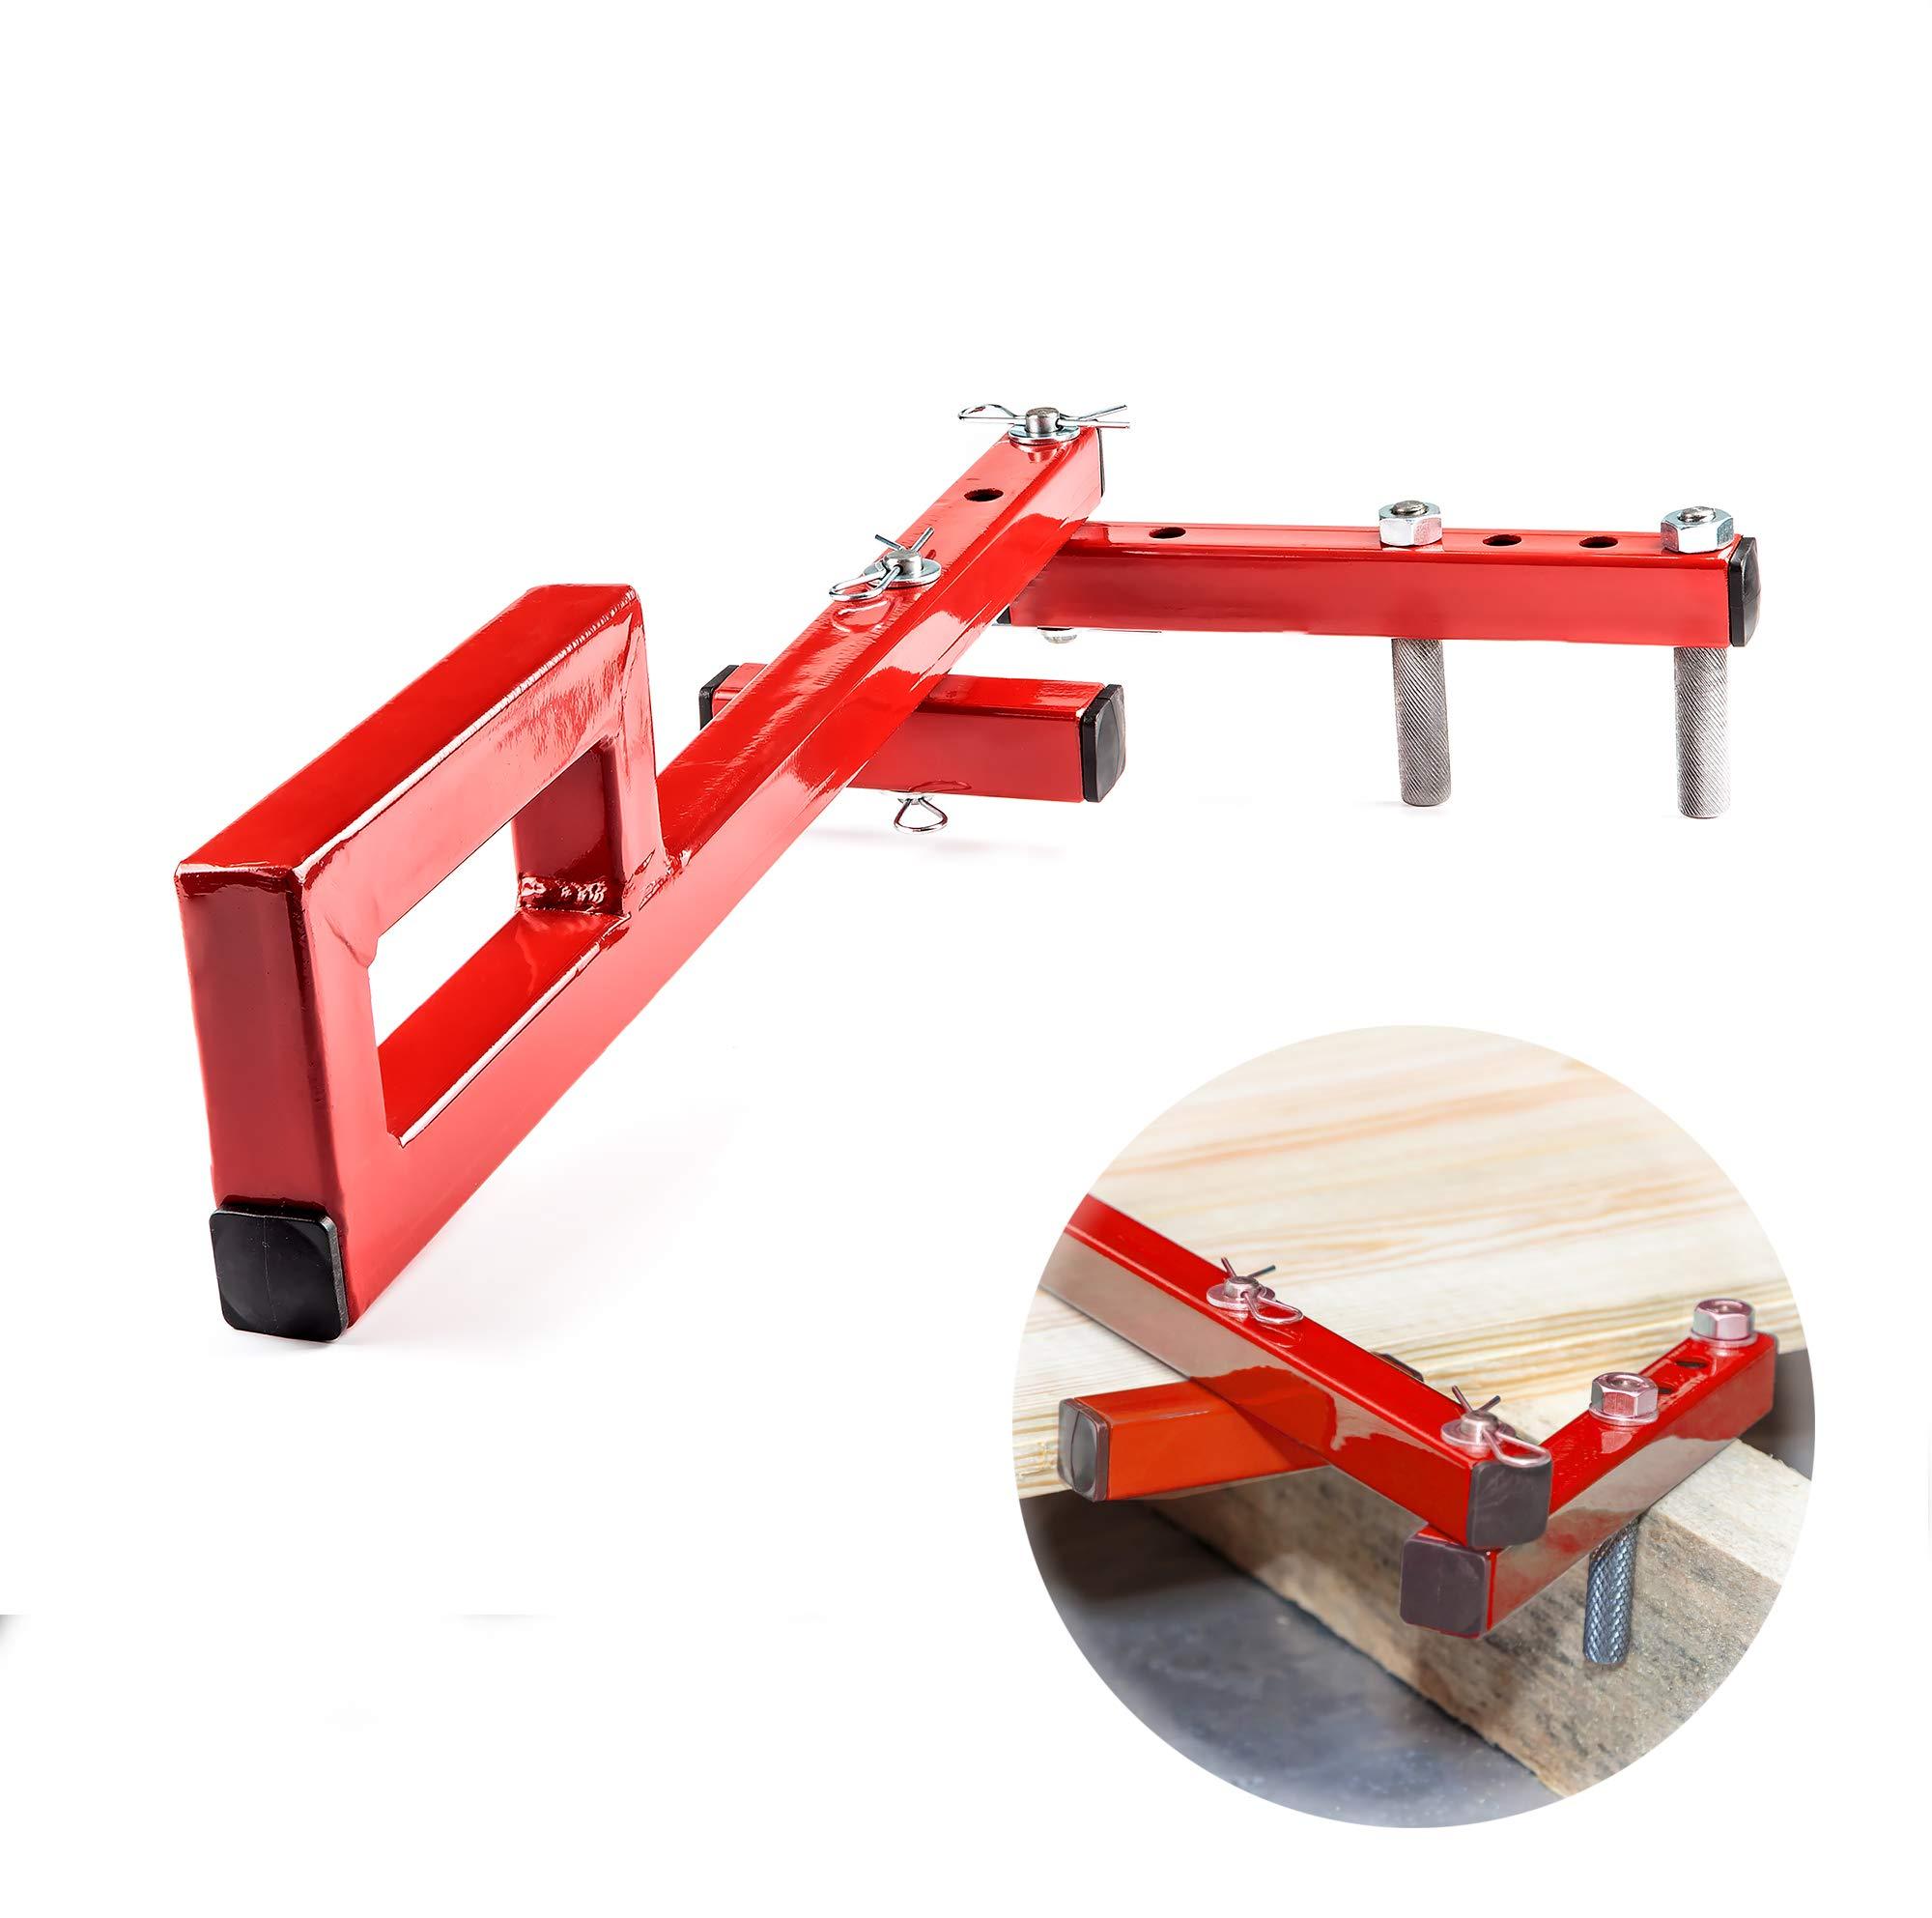 Floor Decking Tool Board Bender - Hardwood Bow Wrench Deck Board Straightener Flooring Jack Straightening Tool - Push & Pull - Extremely Adjustable Gripper Fits 2'' 3'' 4'' 5'' Floor Joists